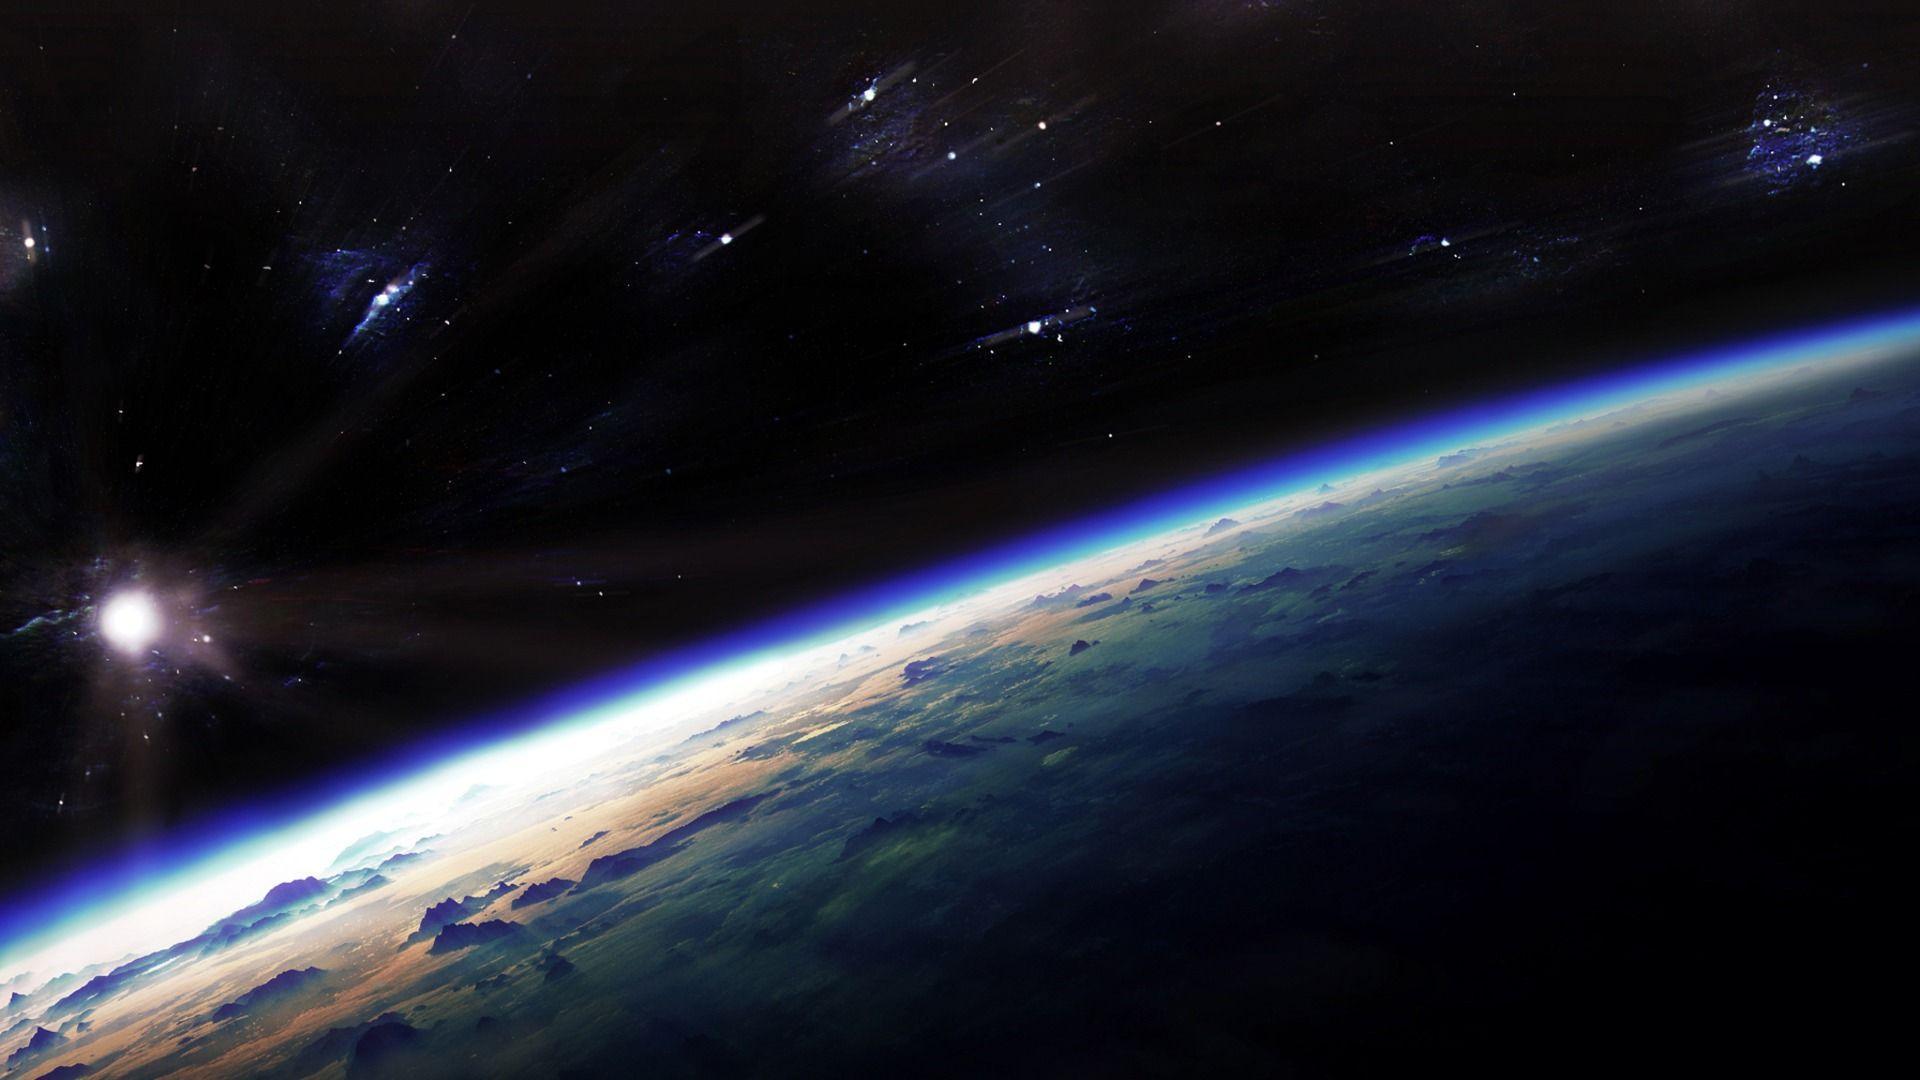 spacecraft wallpaper hd - photo #9